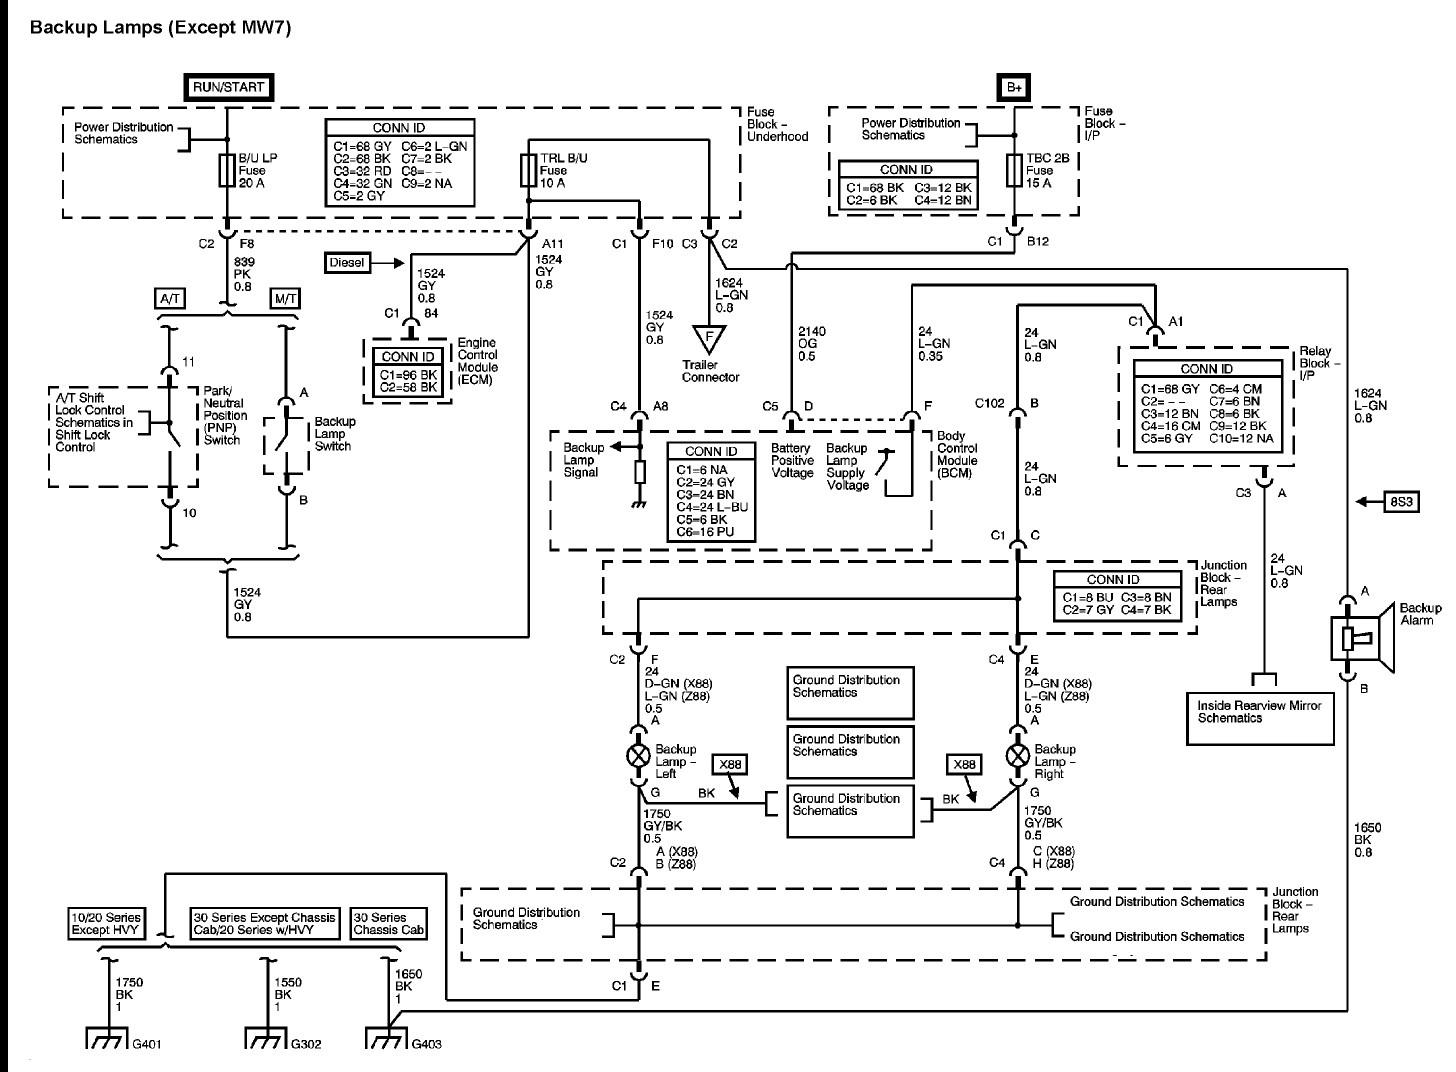 2004 Gmc Seirra Wiring Daigram 2004 Gmc Sierra 2500hd Trailer Wiring Diagram – Trailer Wiring Diagrams Of 2004 Gmc Seirra Wiring Daigram